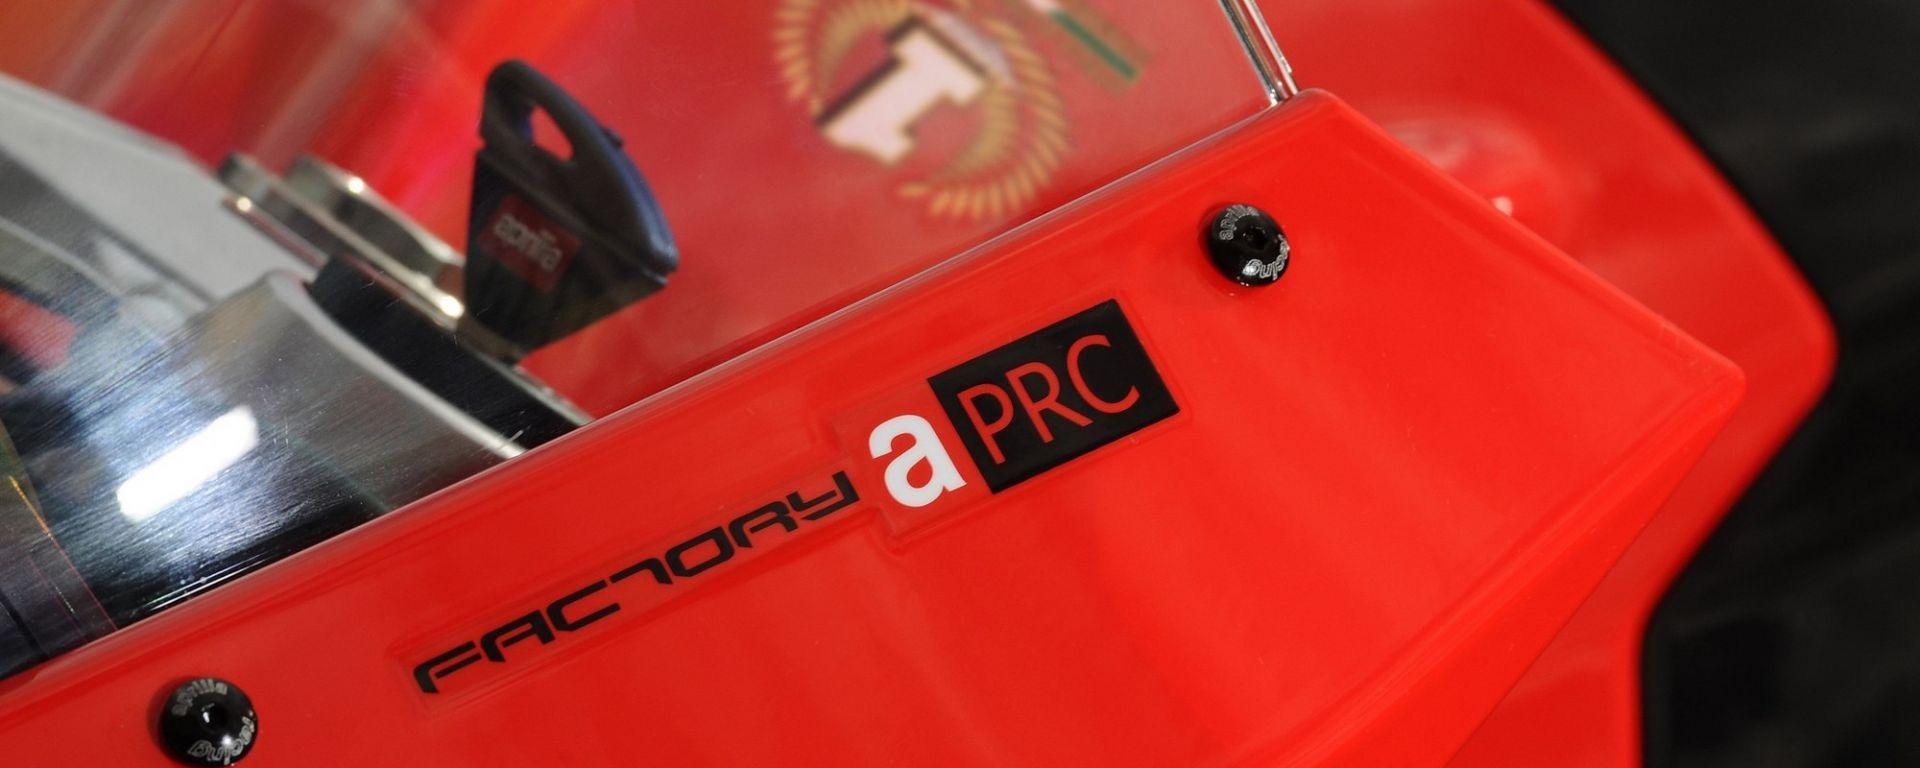 Aprilia APRC manuale di istruzioni video